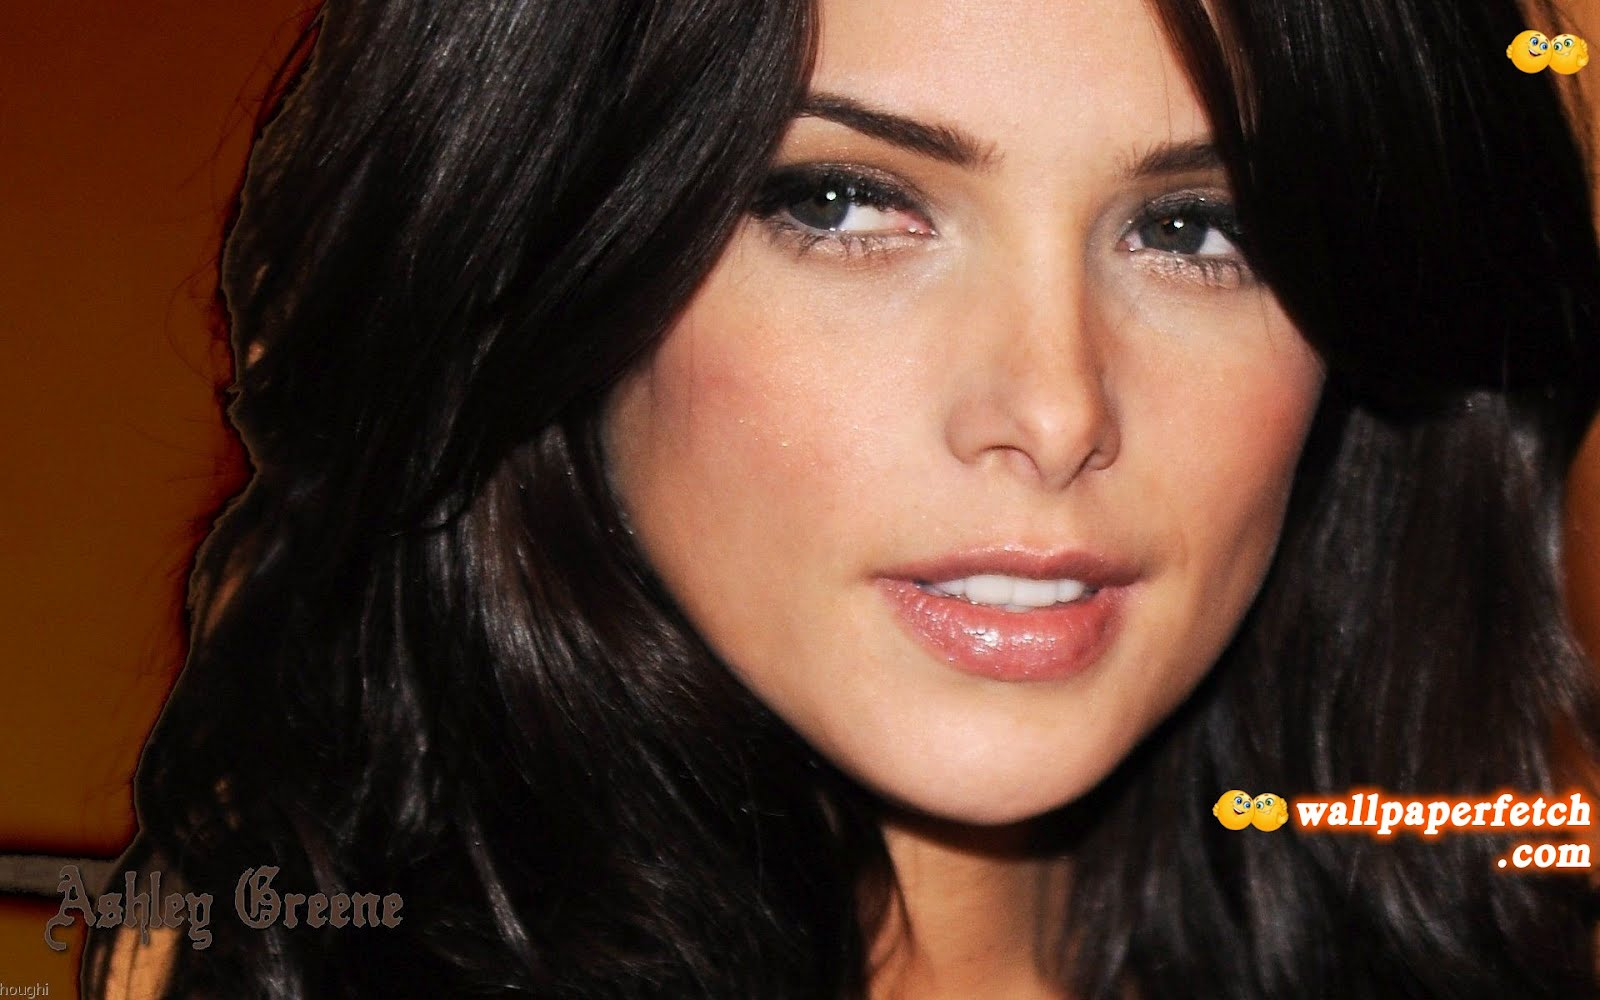 http://2.bp.blogspot.com/-MDj8ADLTCJk/UArWyDMltcI/AAAAAAAAGjY/uaEPbrMZGRY/s1600/ashley-greene-beautiful-girl_1920x1200_90004.jpg